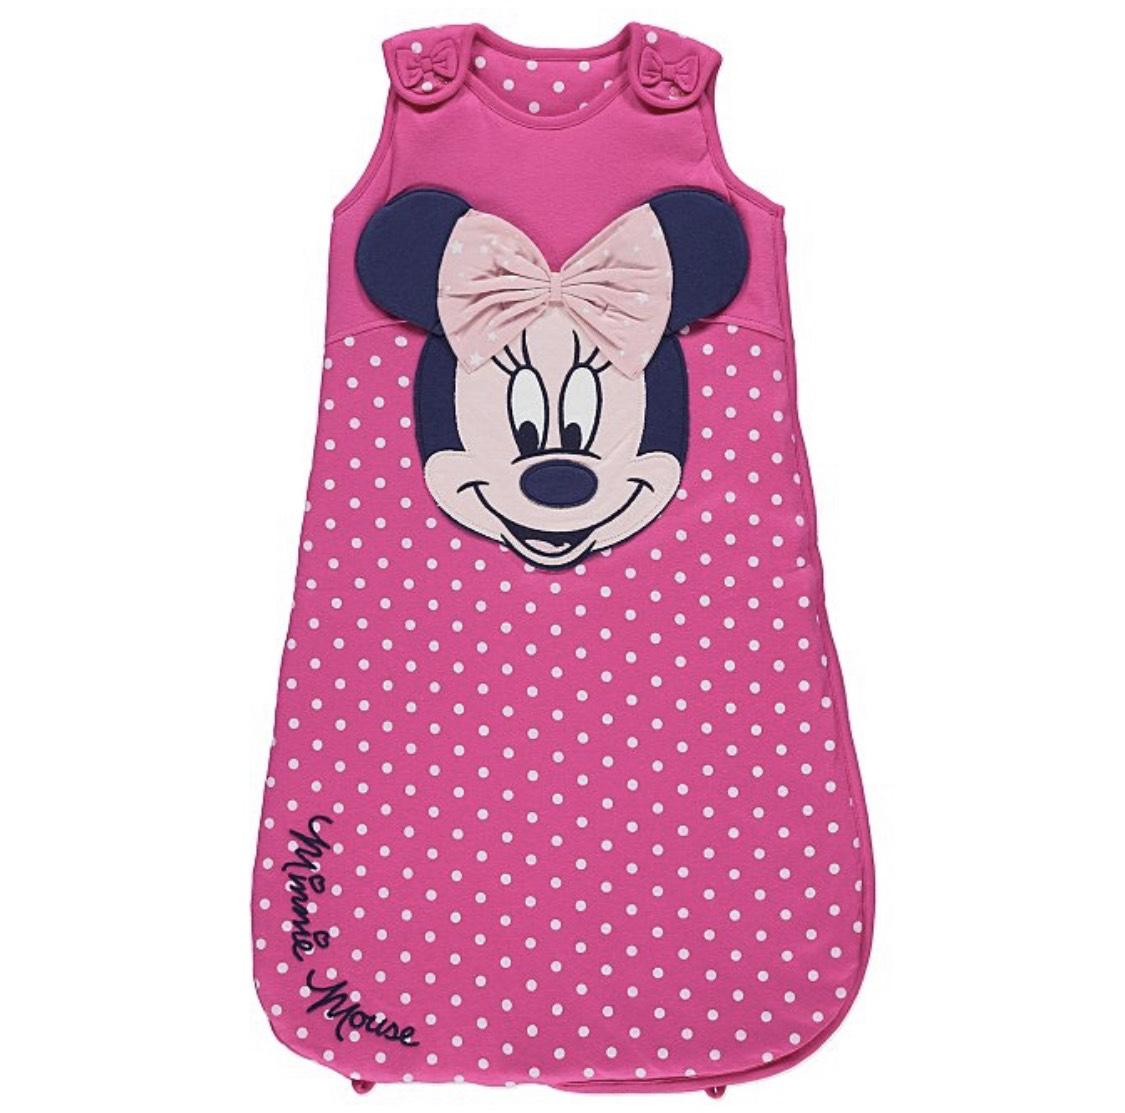 Disney Minnie Mouse Pink Polka Dot 2.5 Tog Sleeping Bag 0-6months £7 free c&c @ Asda